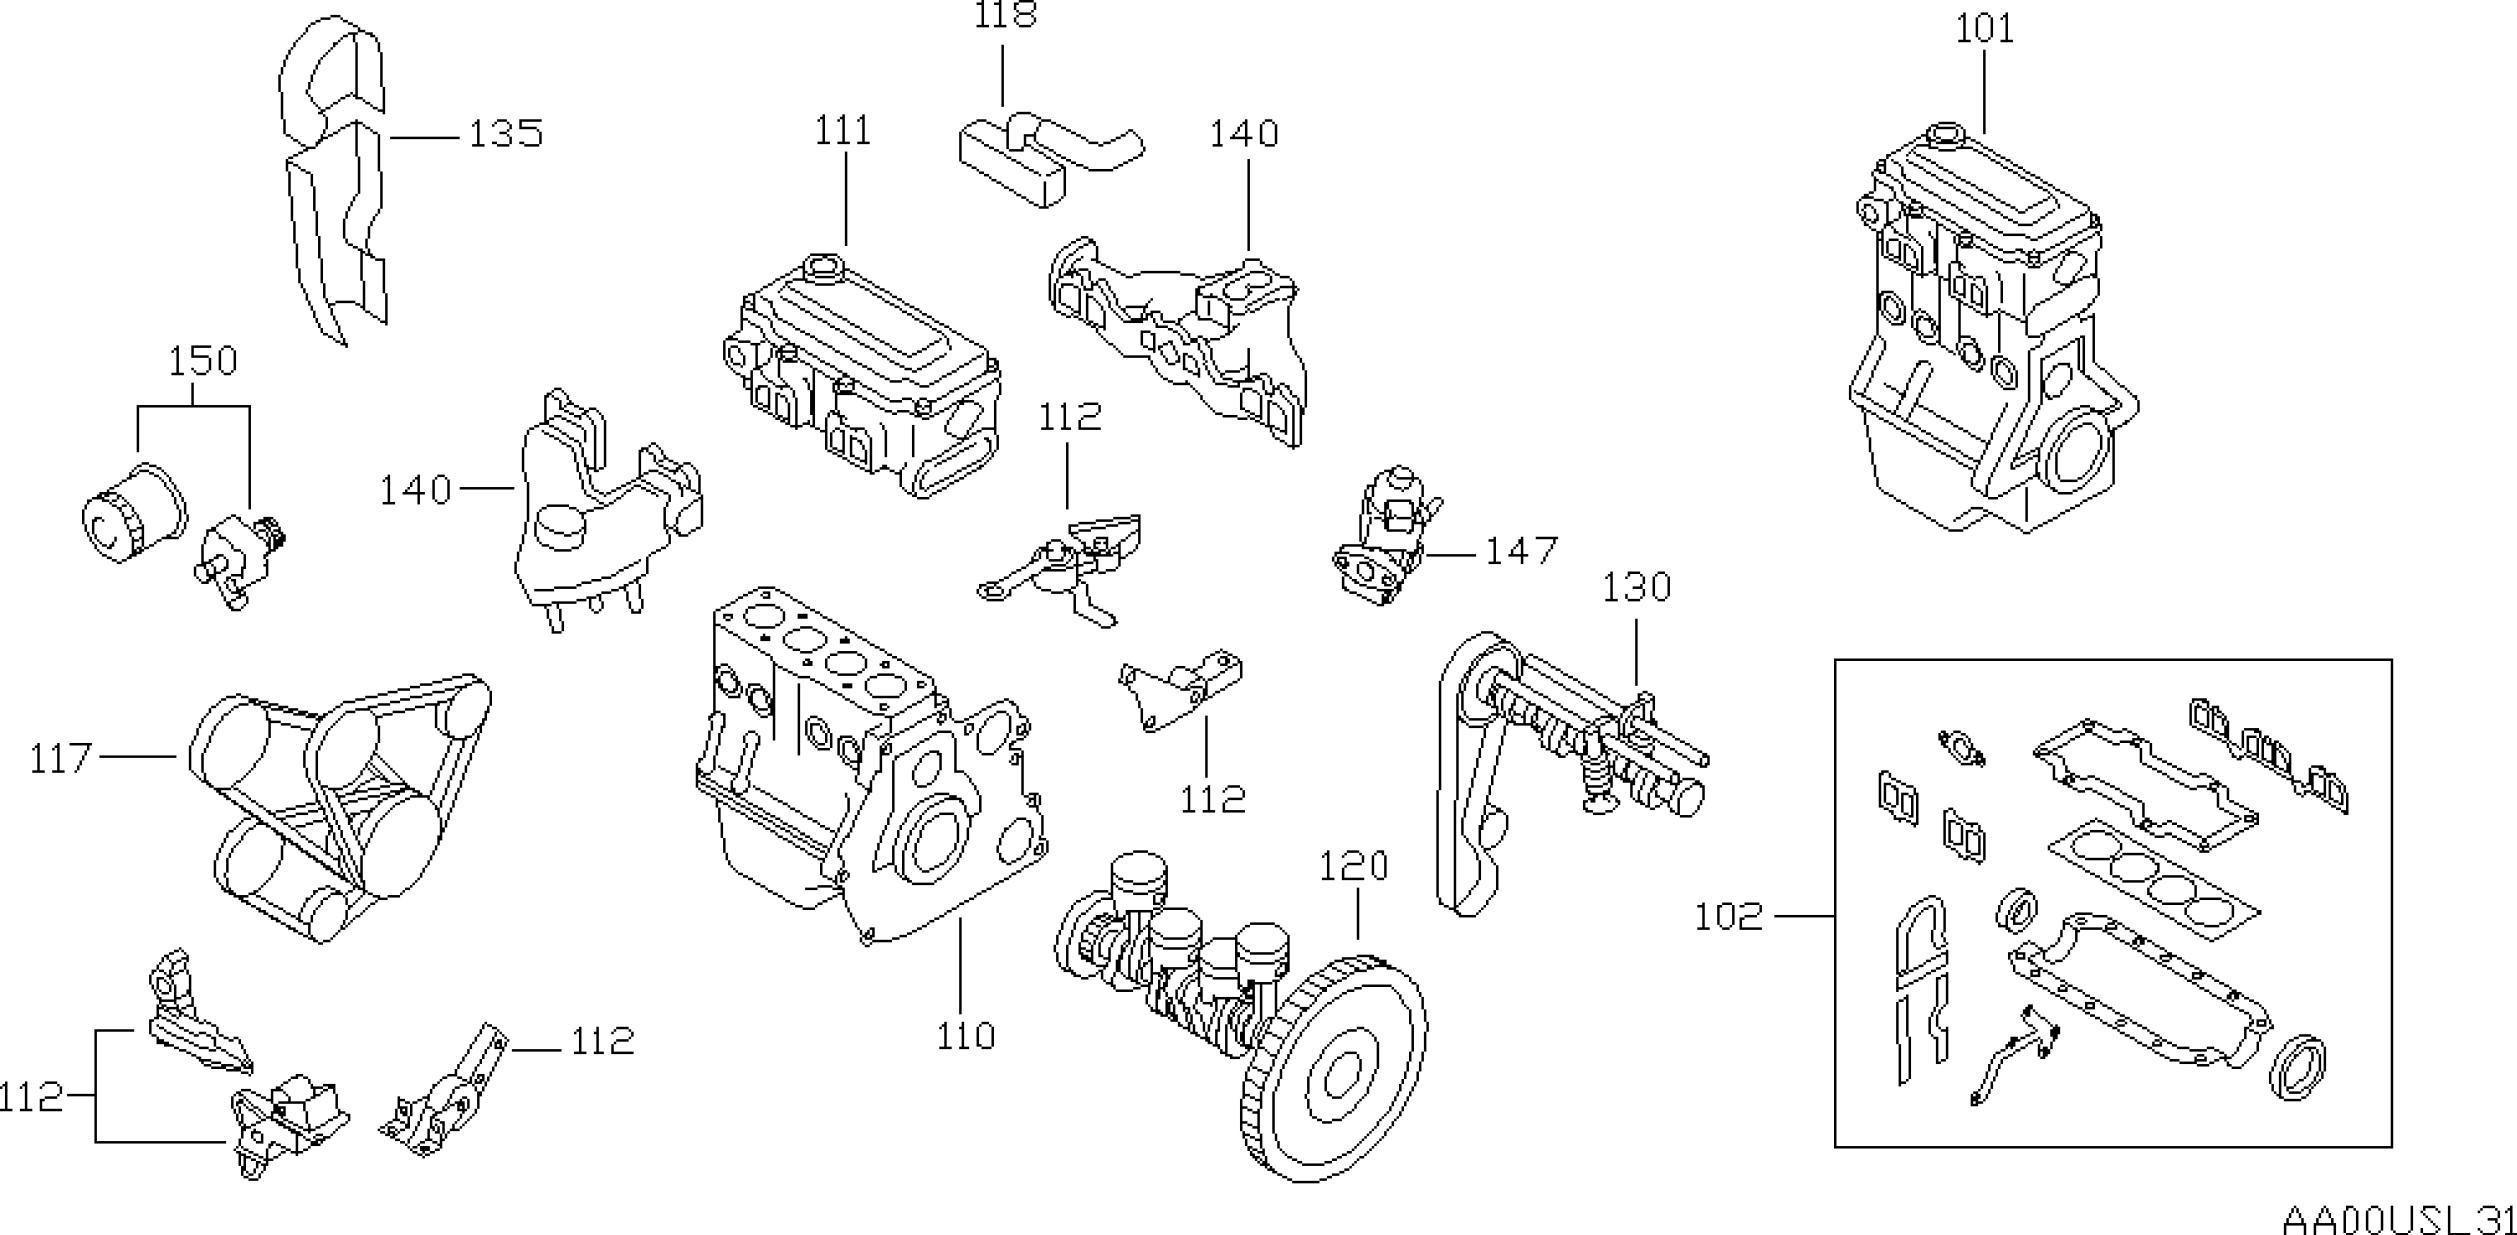 2012 Nissan Altima Engine Diagram 98 Nissan Altima Fuse